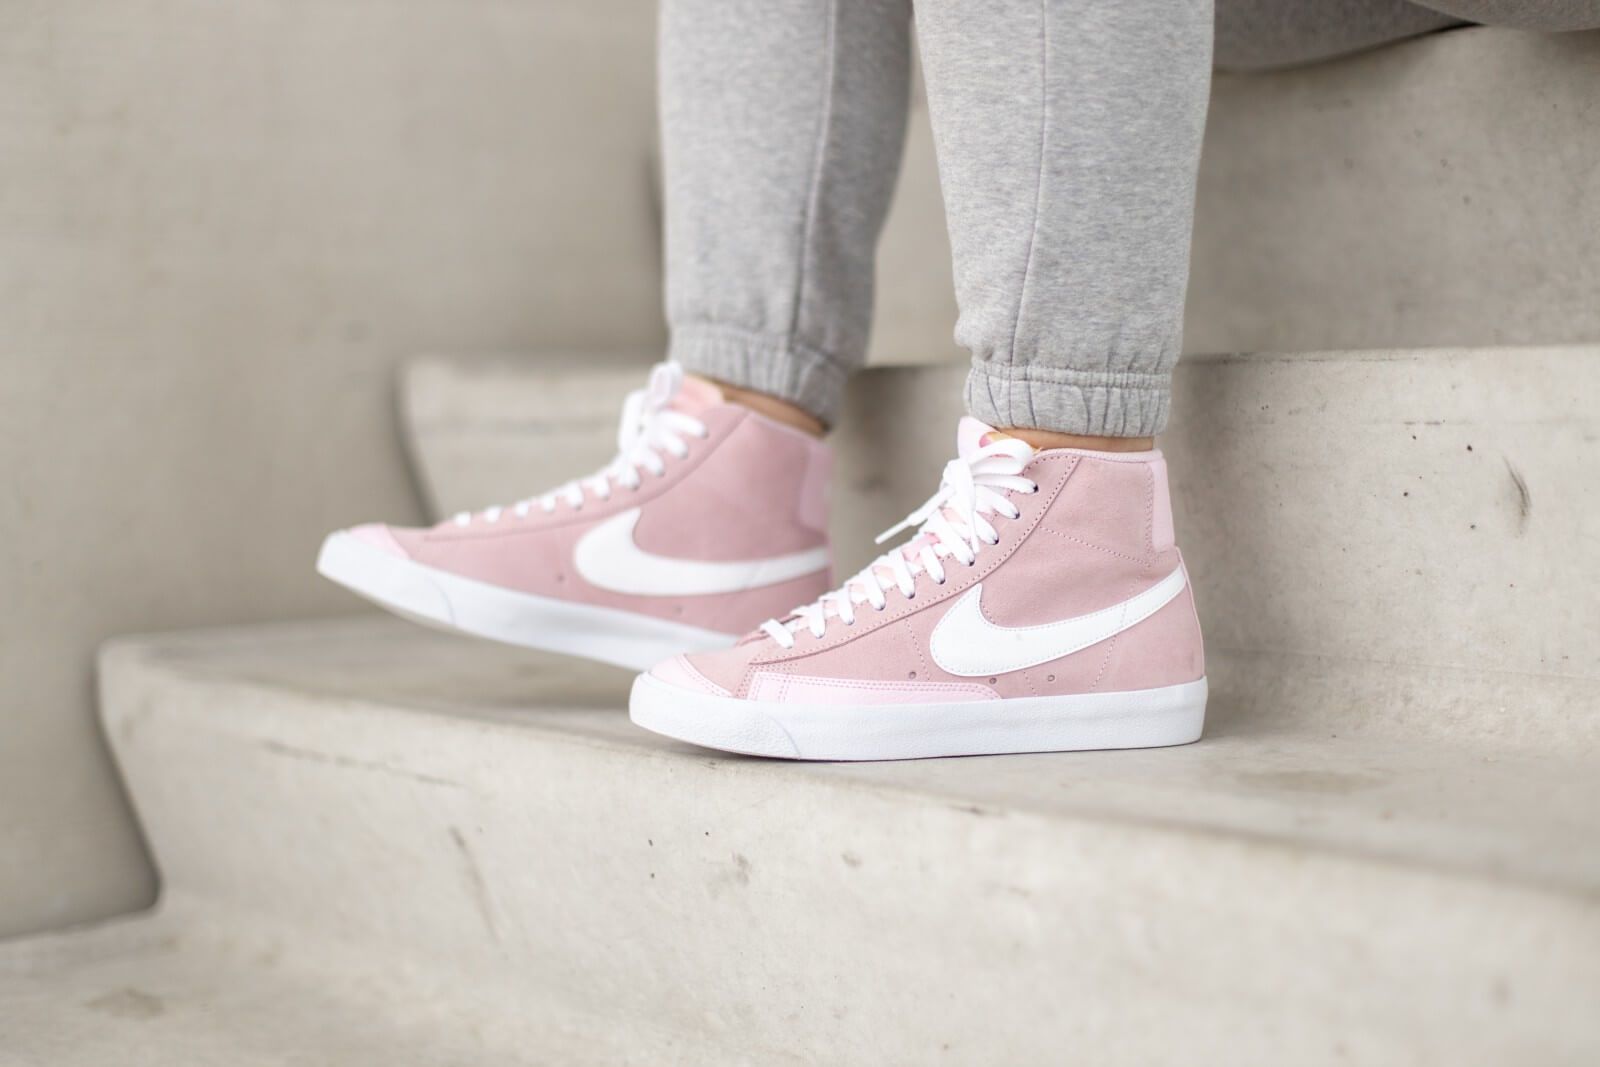 Nike Women's Blazer Mid '77 Vintage Pink Foam/White